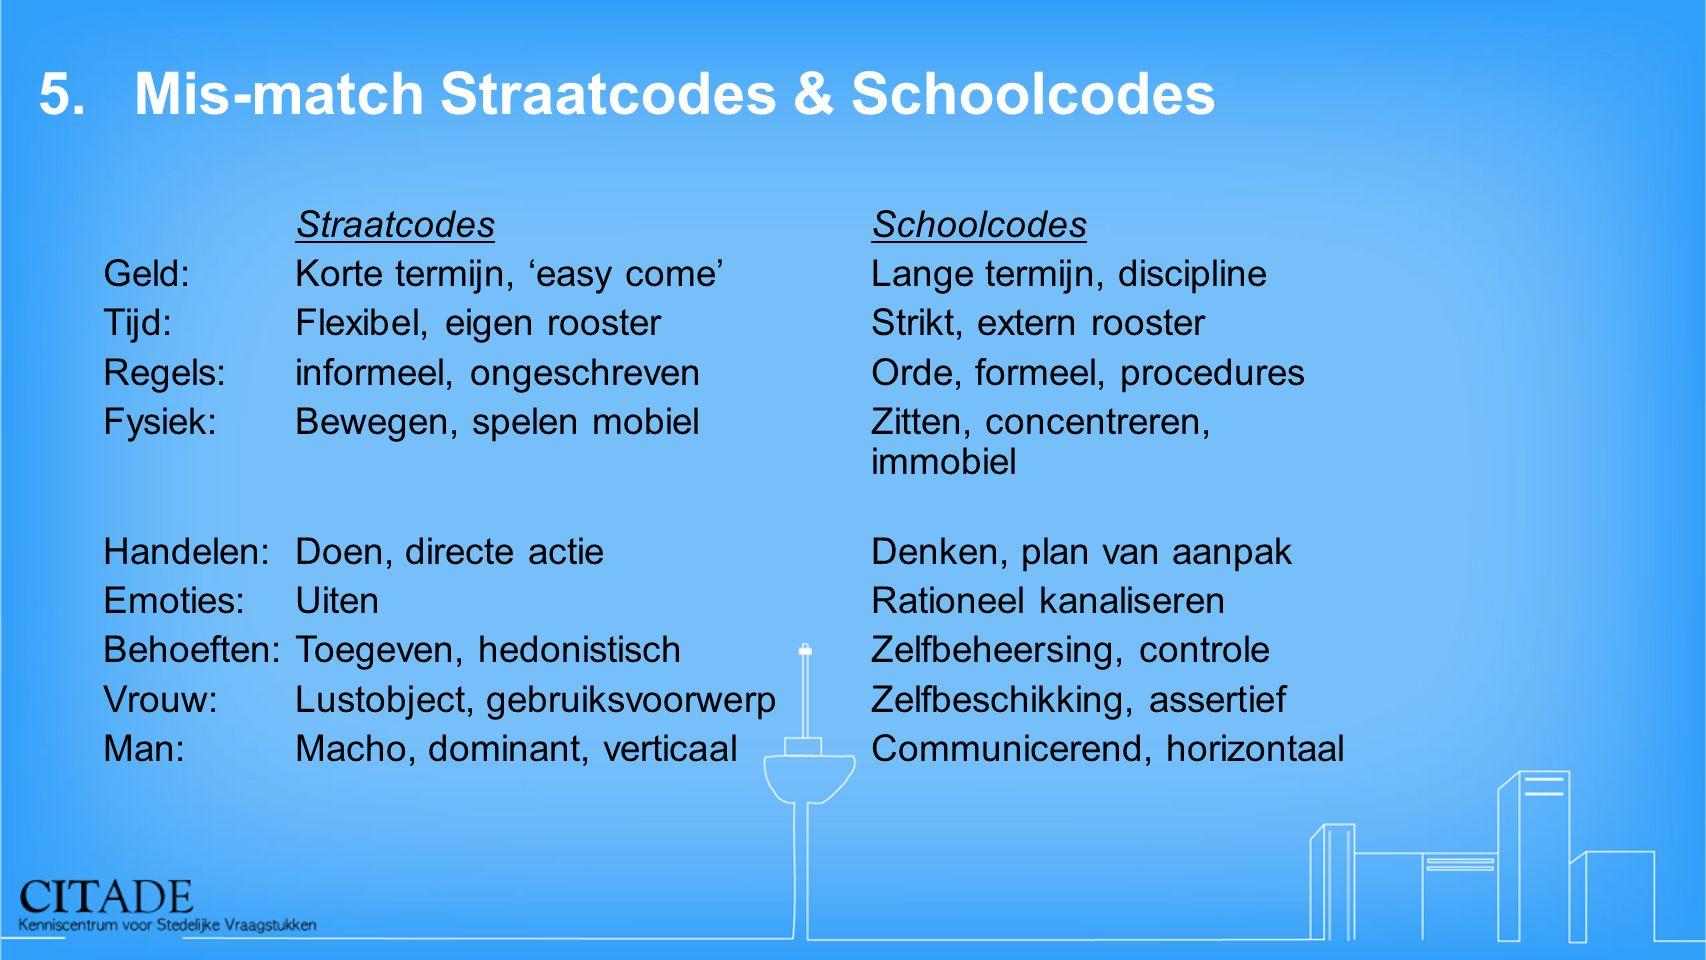 5. Mis-match Straatcodes & Schoolcodes